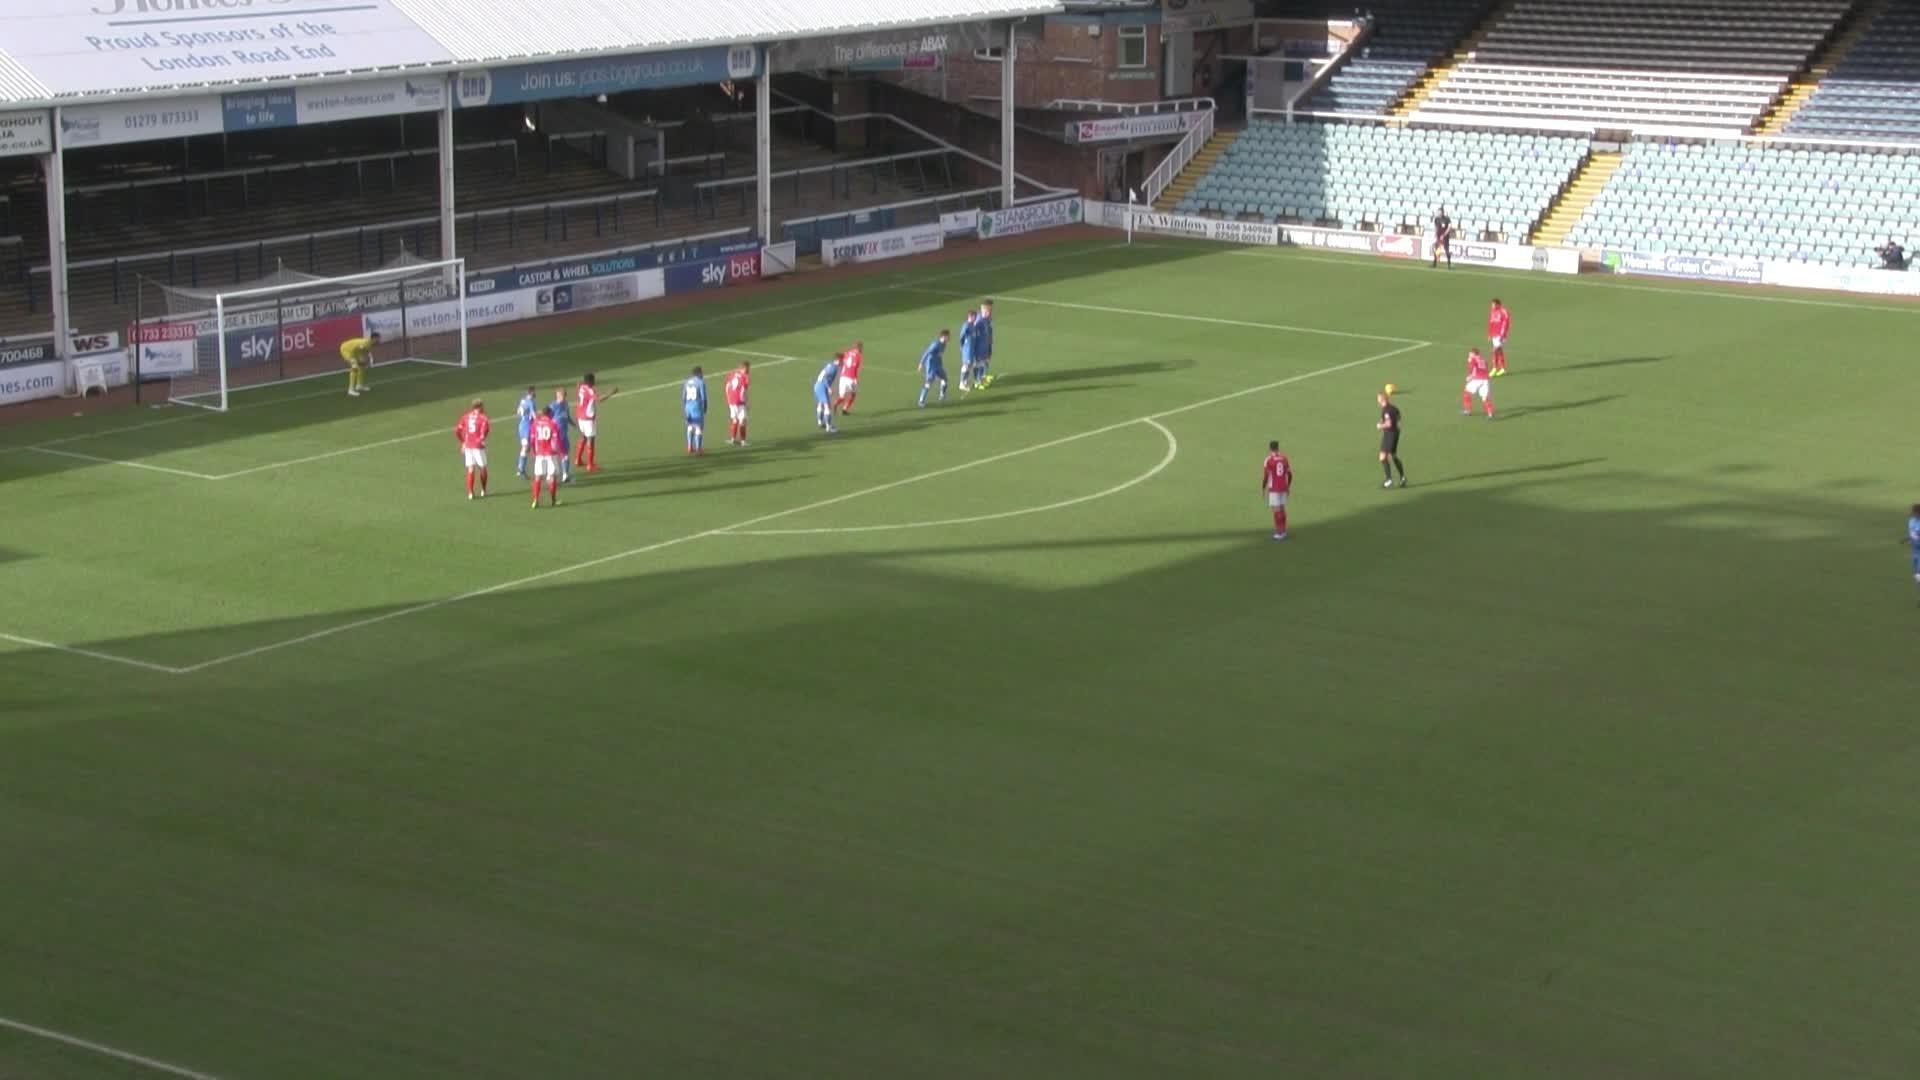 U23 HIGHLIGHTS | Peterborough United 0 Charlton 3